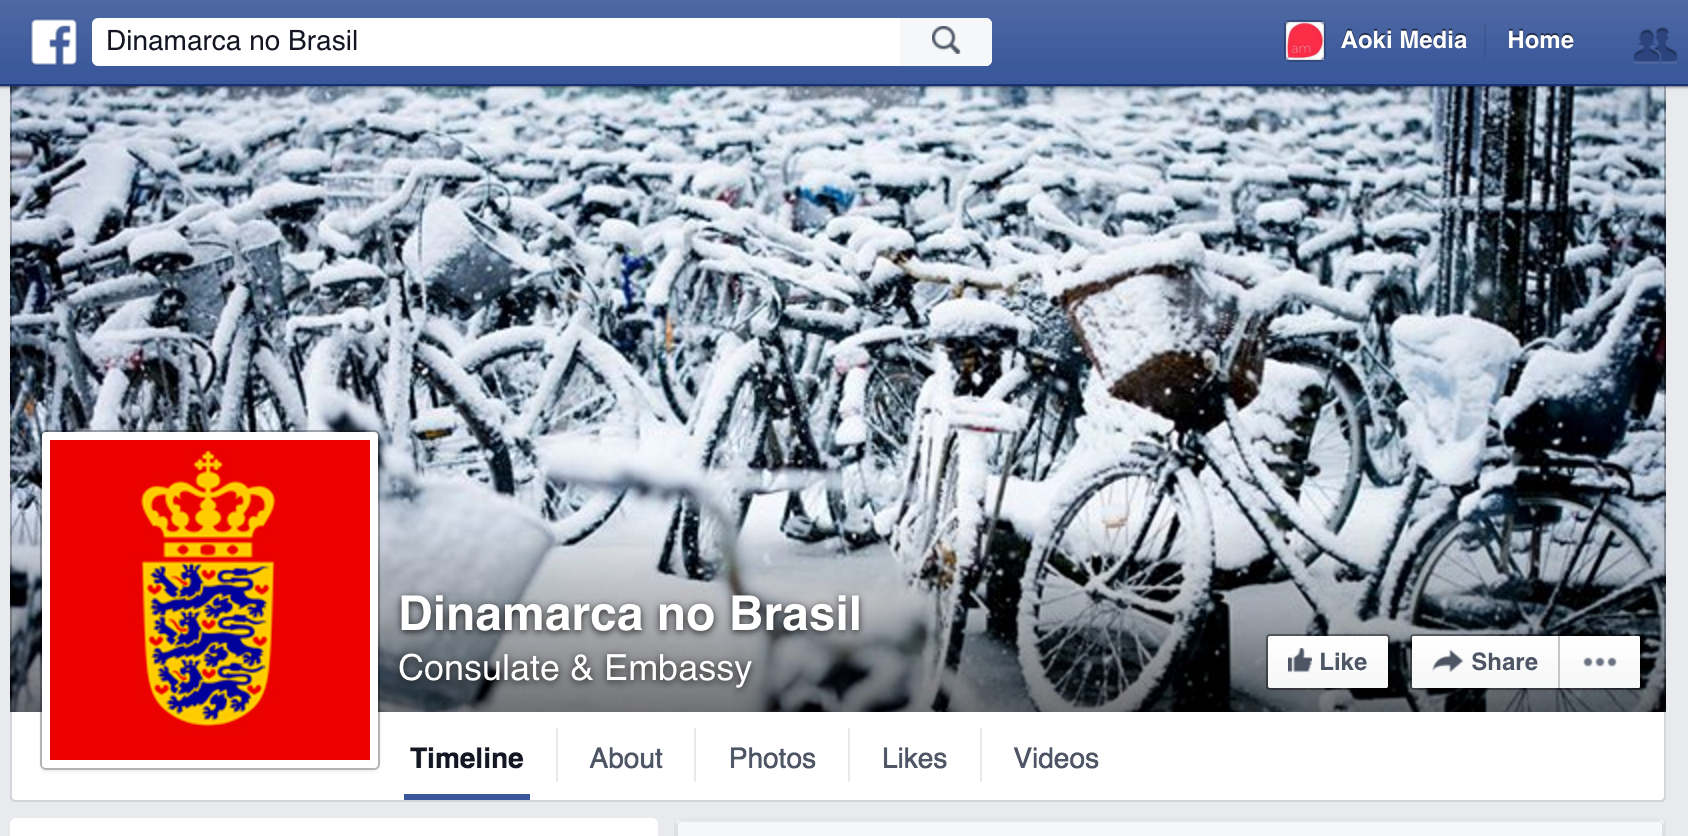 Foto de capa da Embaixada da Dinamarca no Brasil.